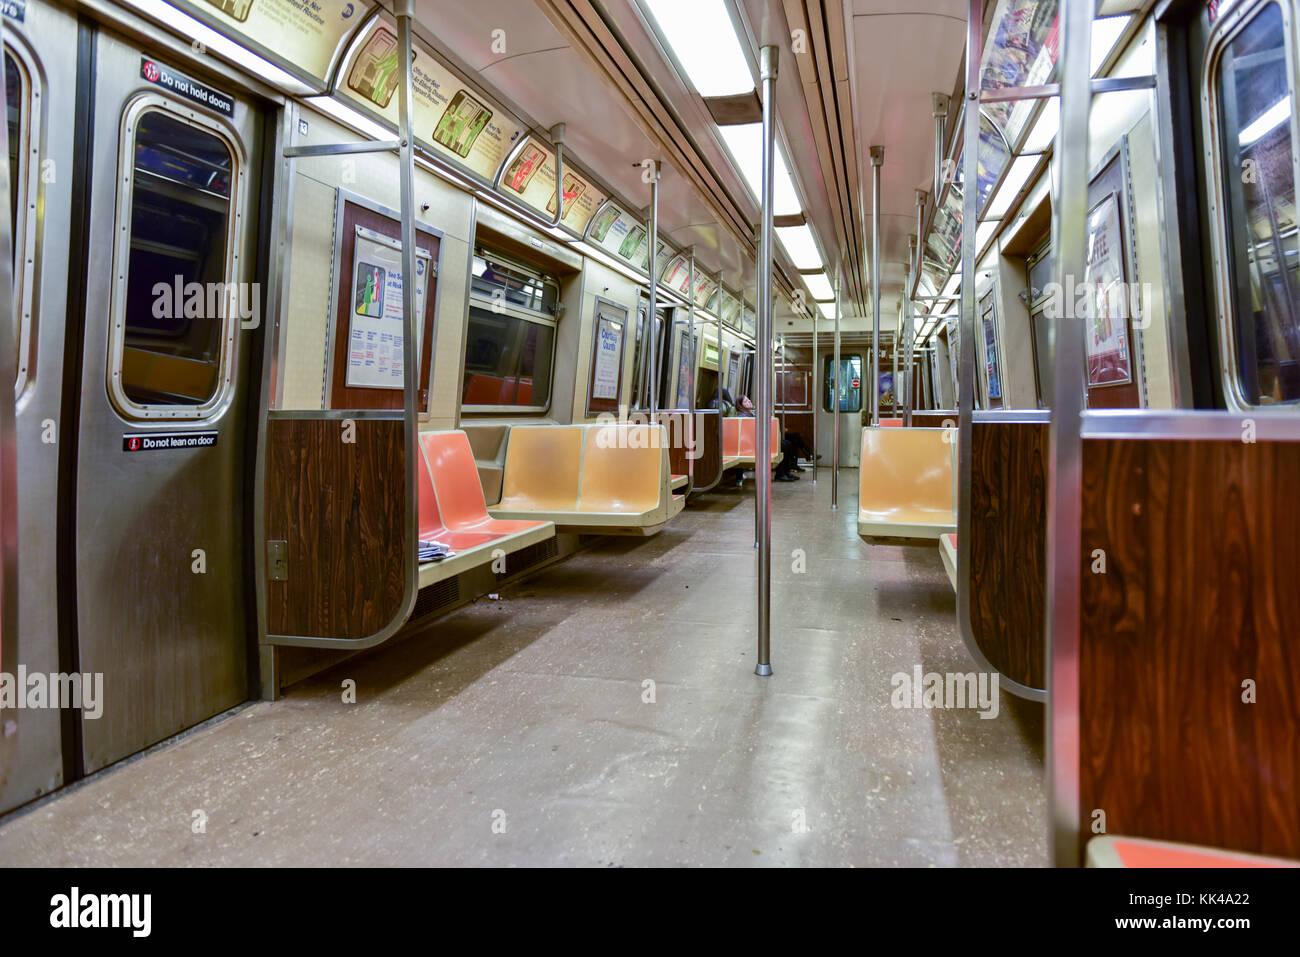 train door inside light stock photos train door inside light stock images alamy. Black Bedroom Furniture Sets. Home Design Ideas